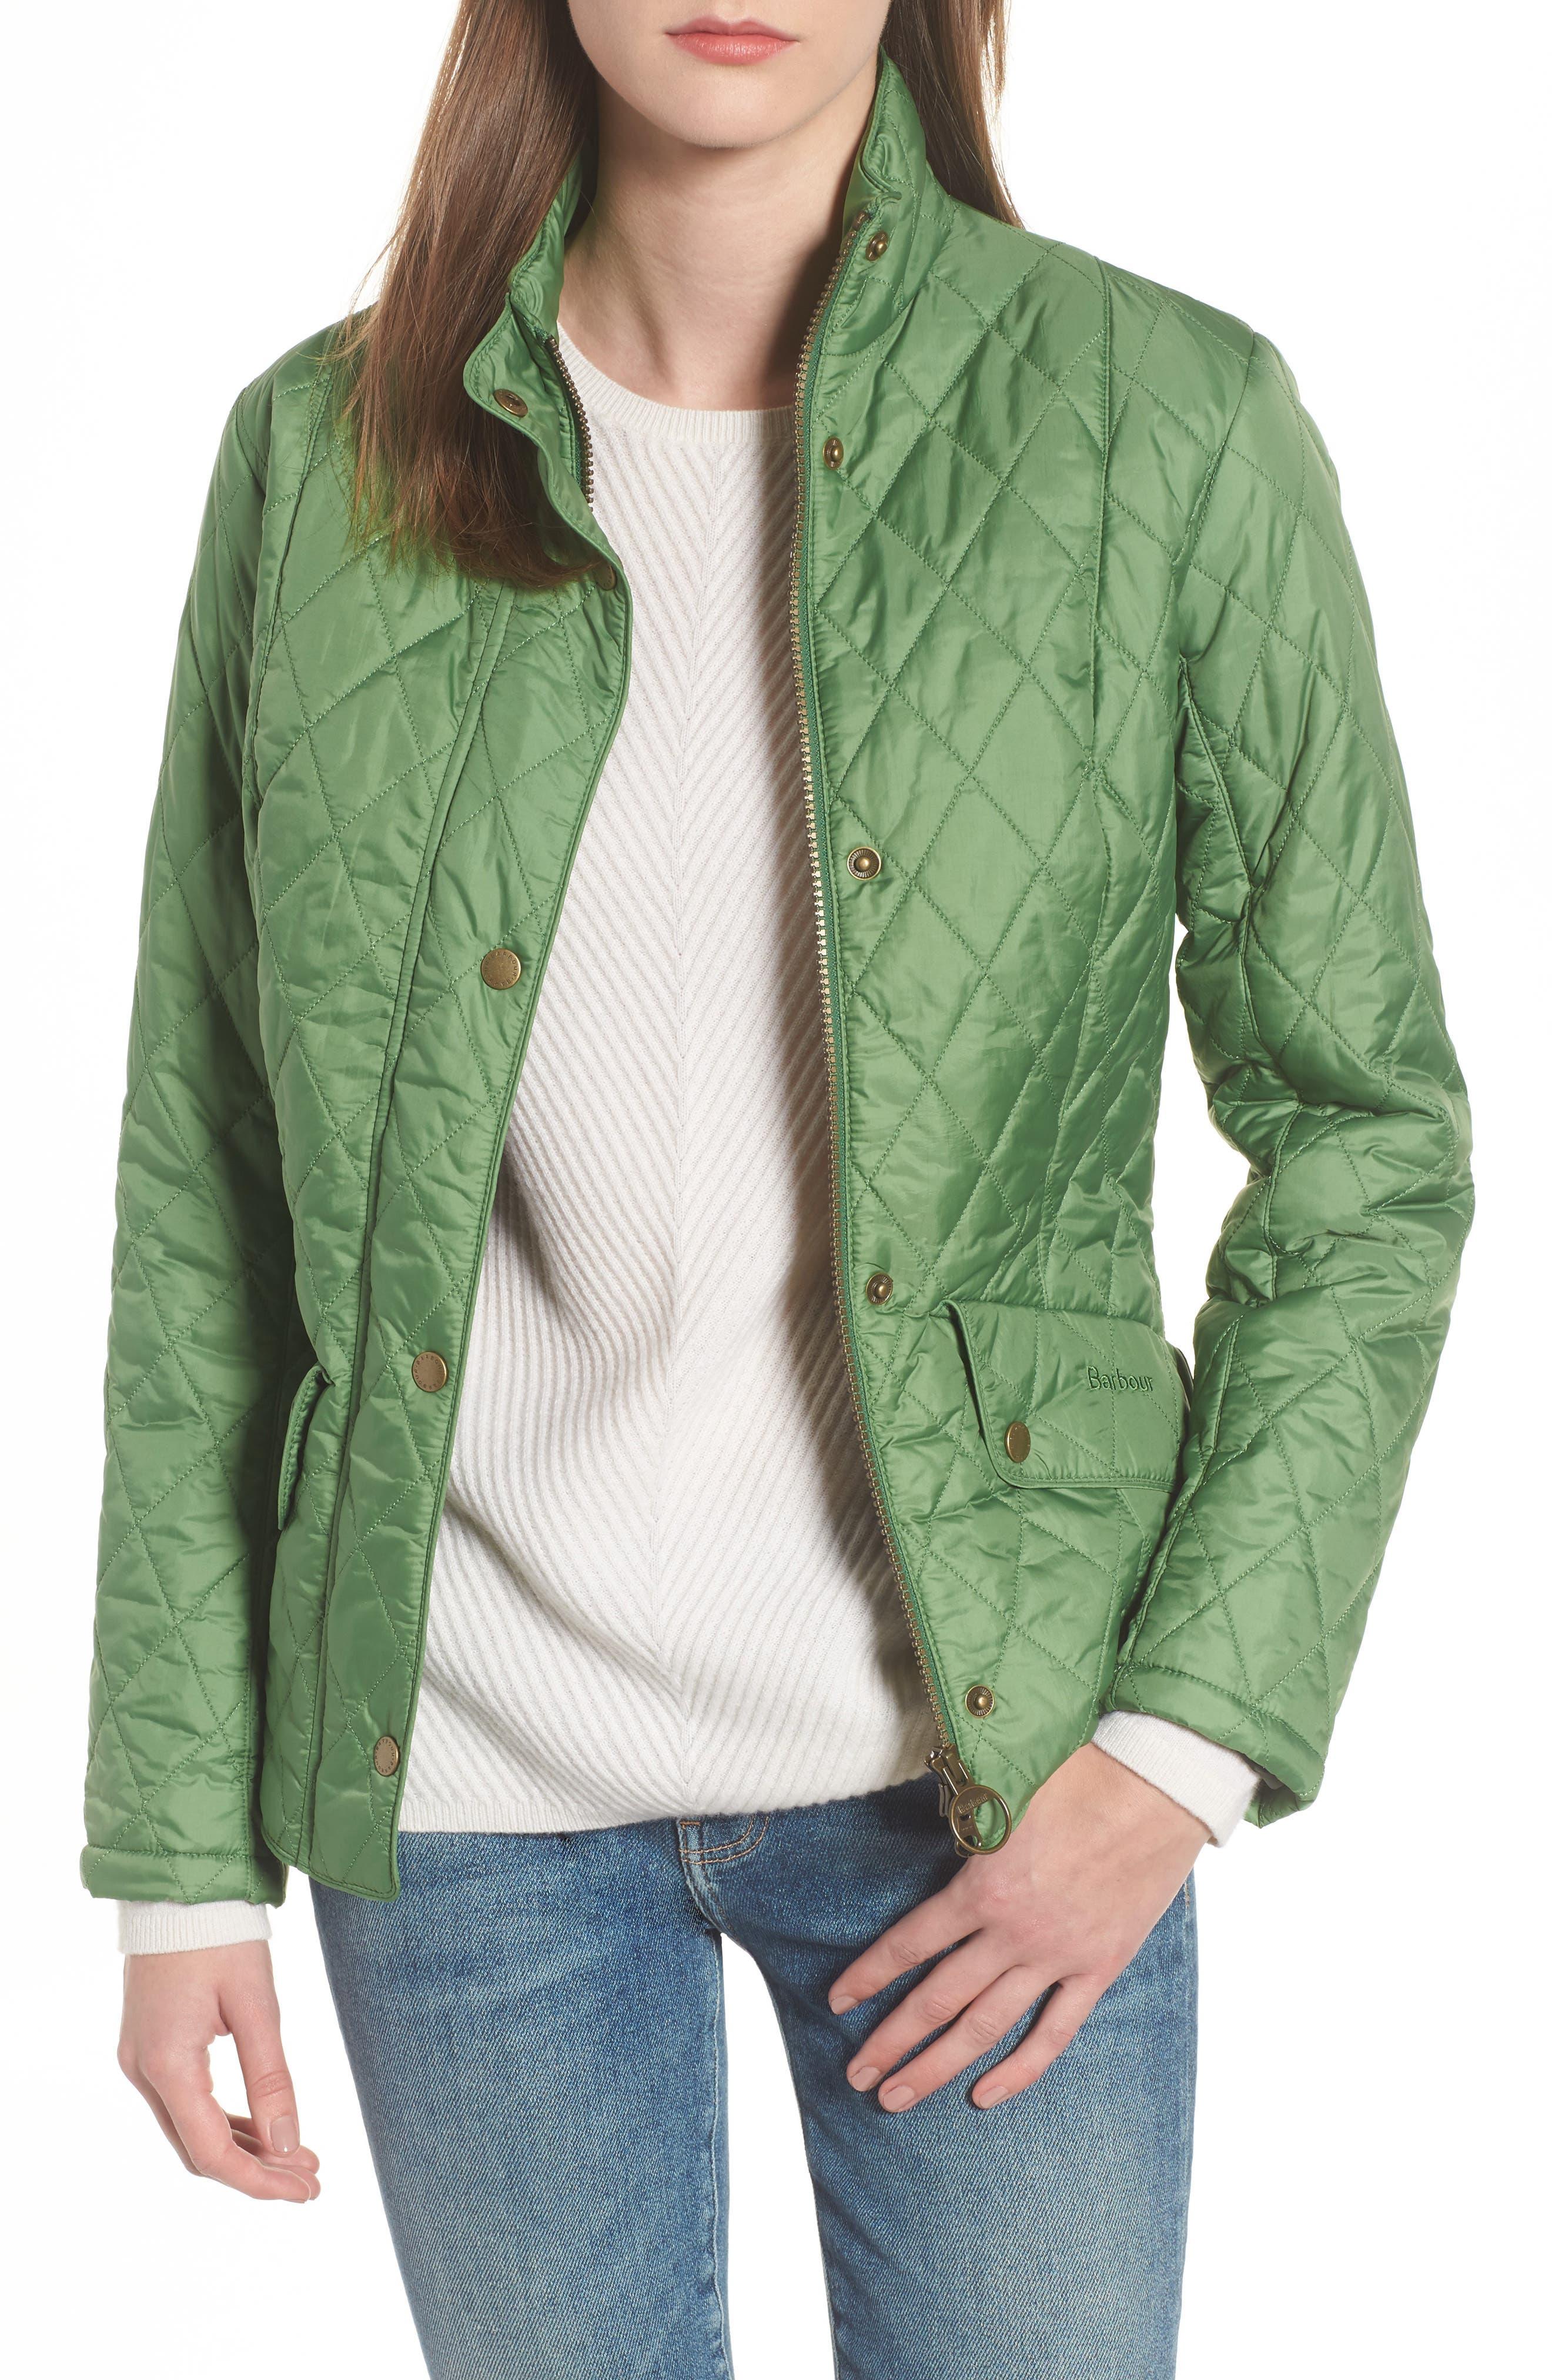 Barbour Cavalry Flyweight Quilt Jacket, US / 10 UK - Green